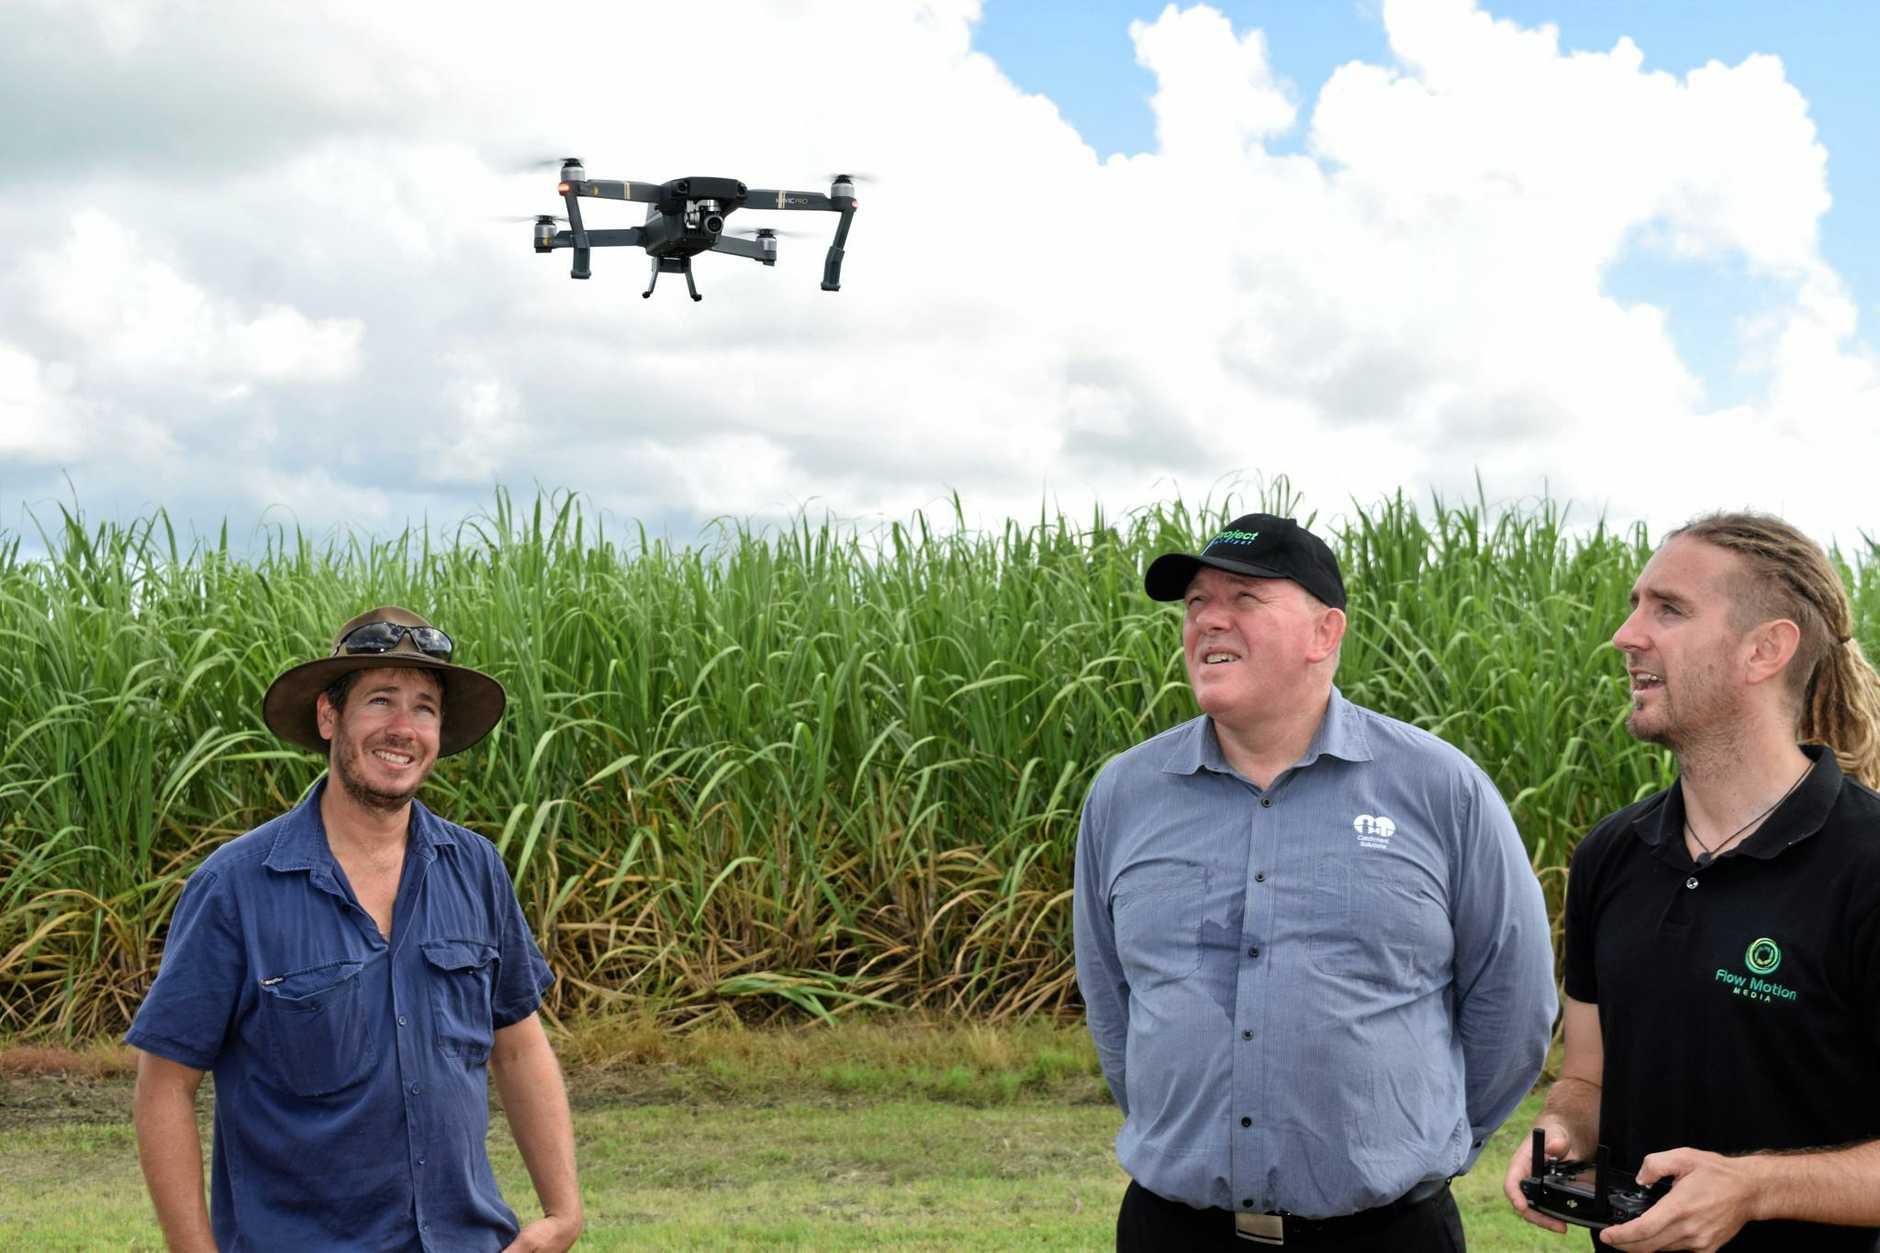 Cane grower Phil Deguara, Project Catalyst coordinator Craig Davenport and cinematographer Jac Kotze.